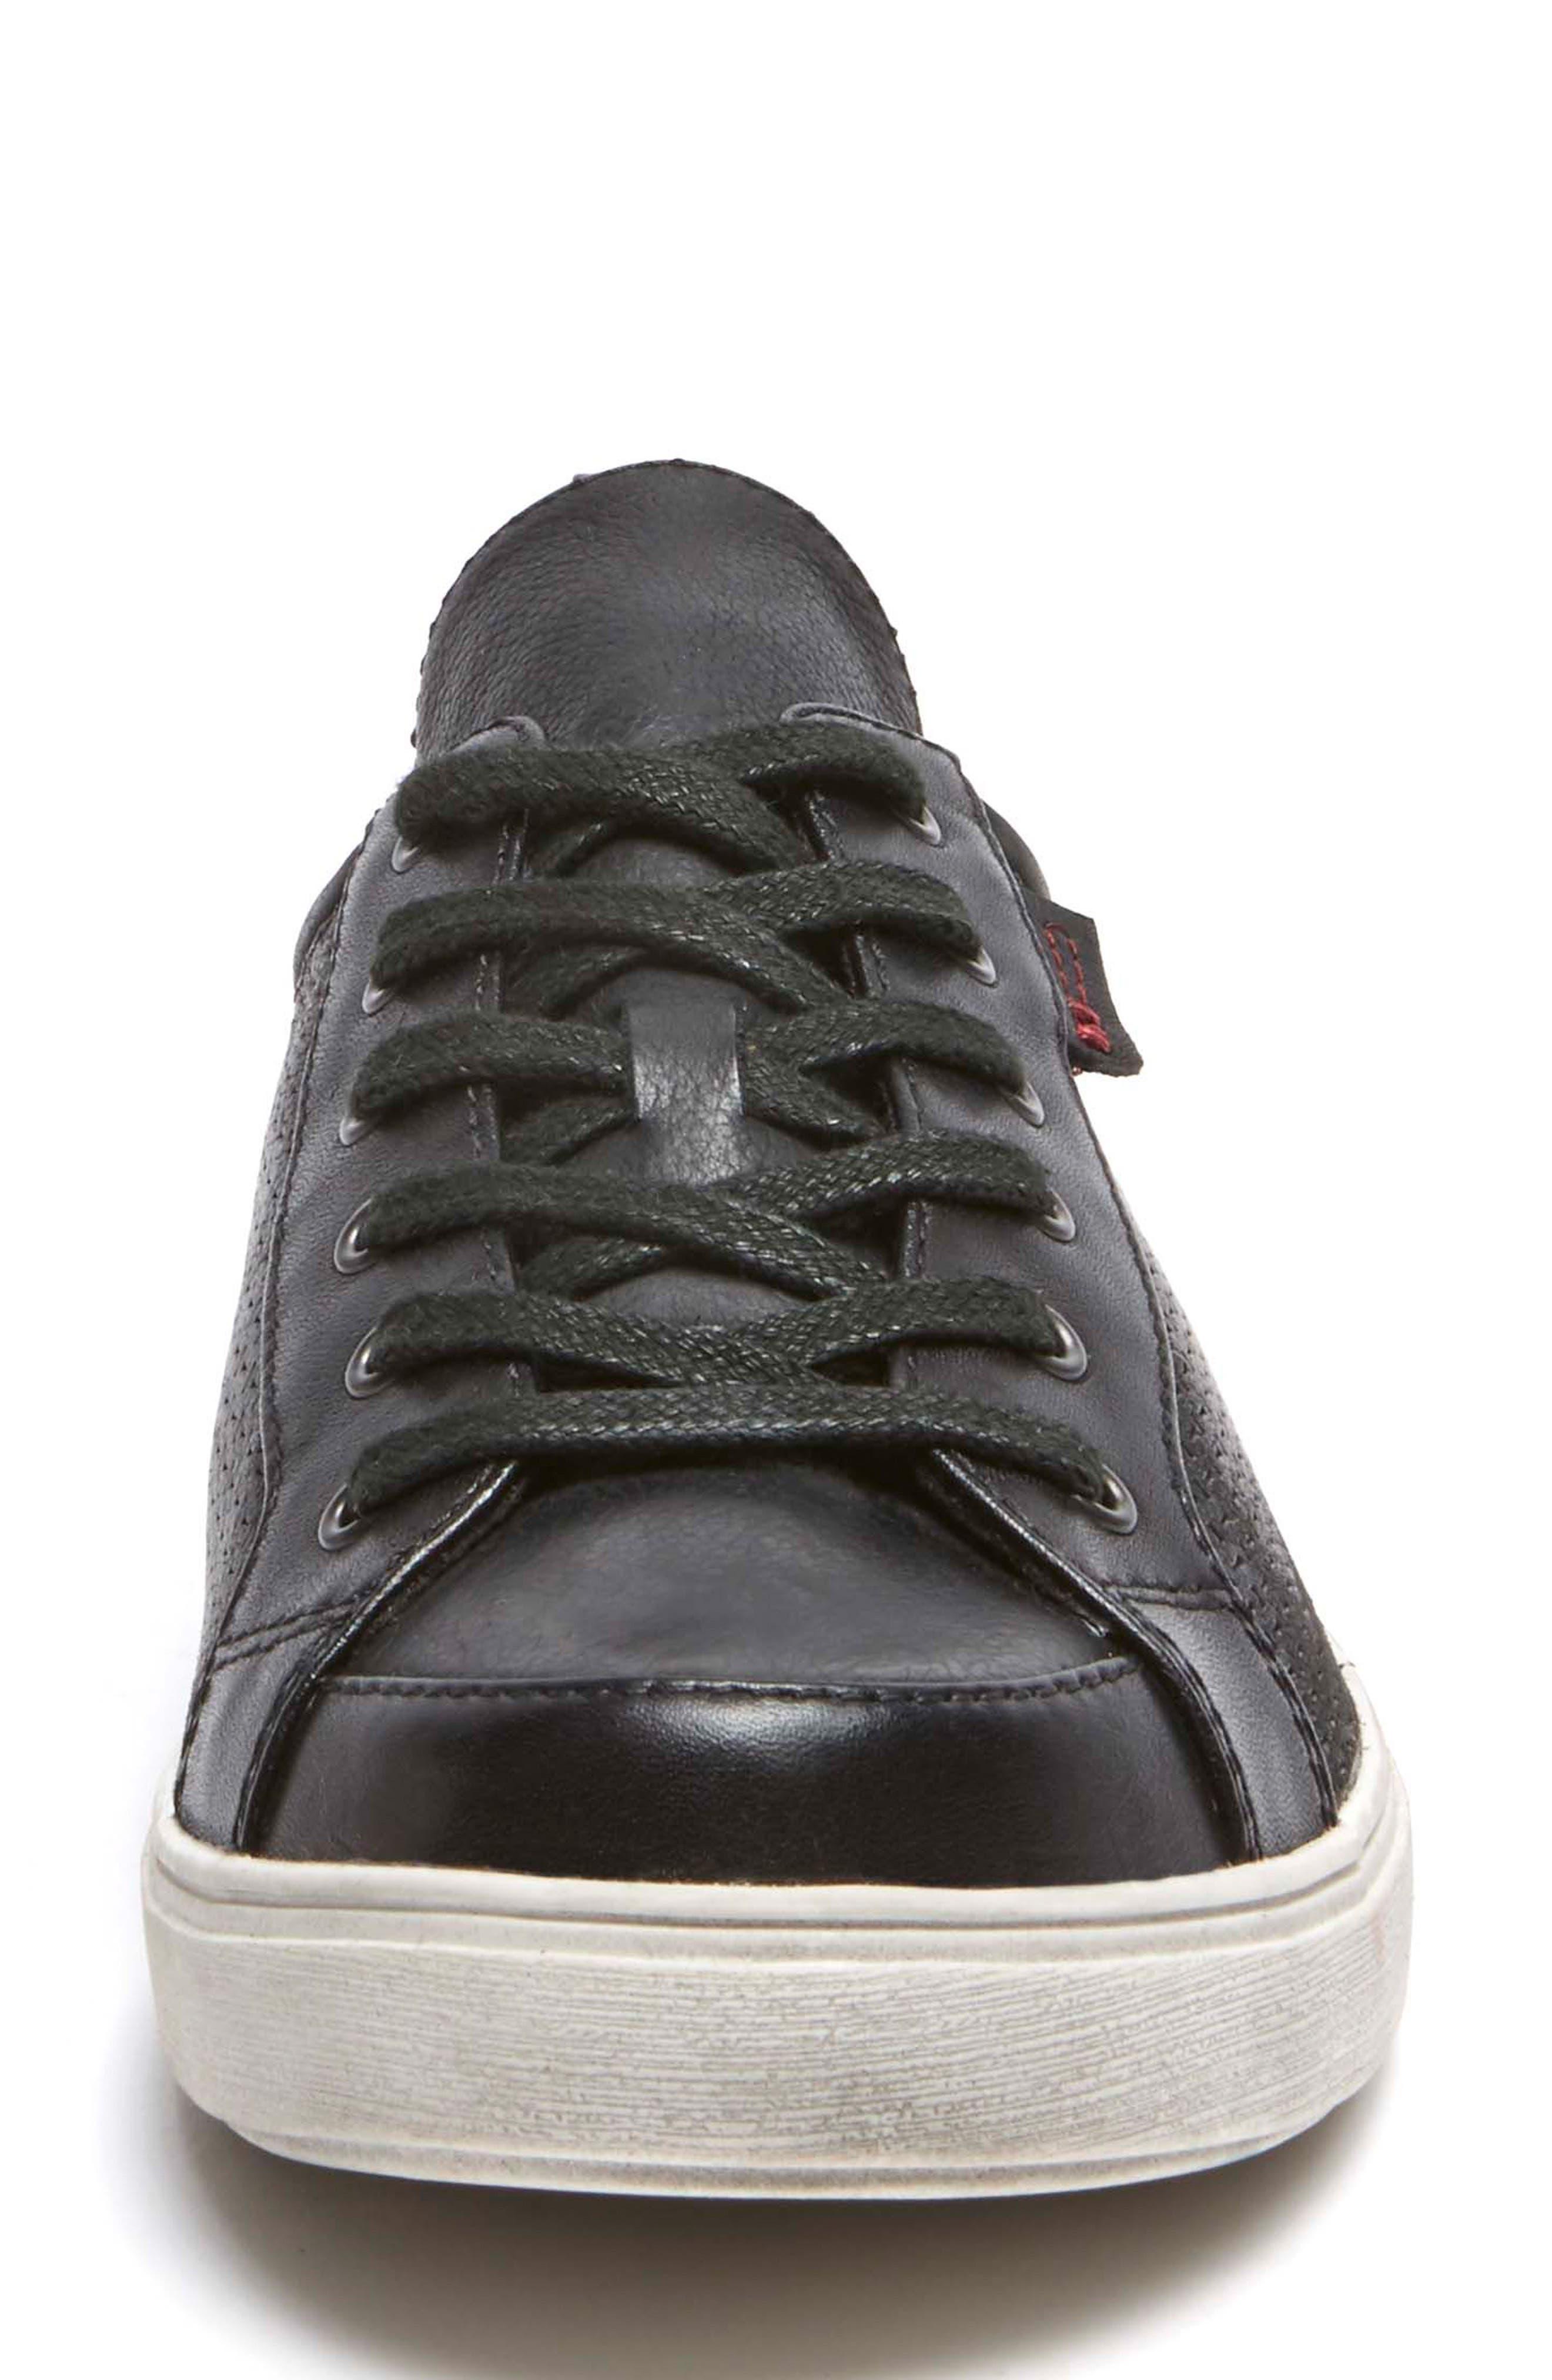 Willa Sneaker,                             Alternate thumbnail 4, color,                             BLACK LEATHER